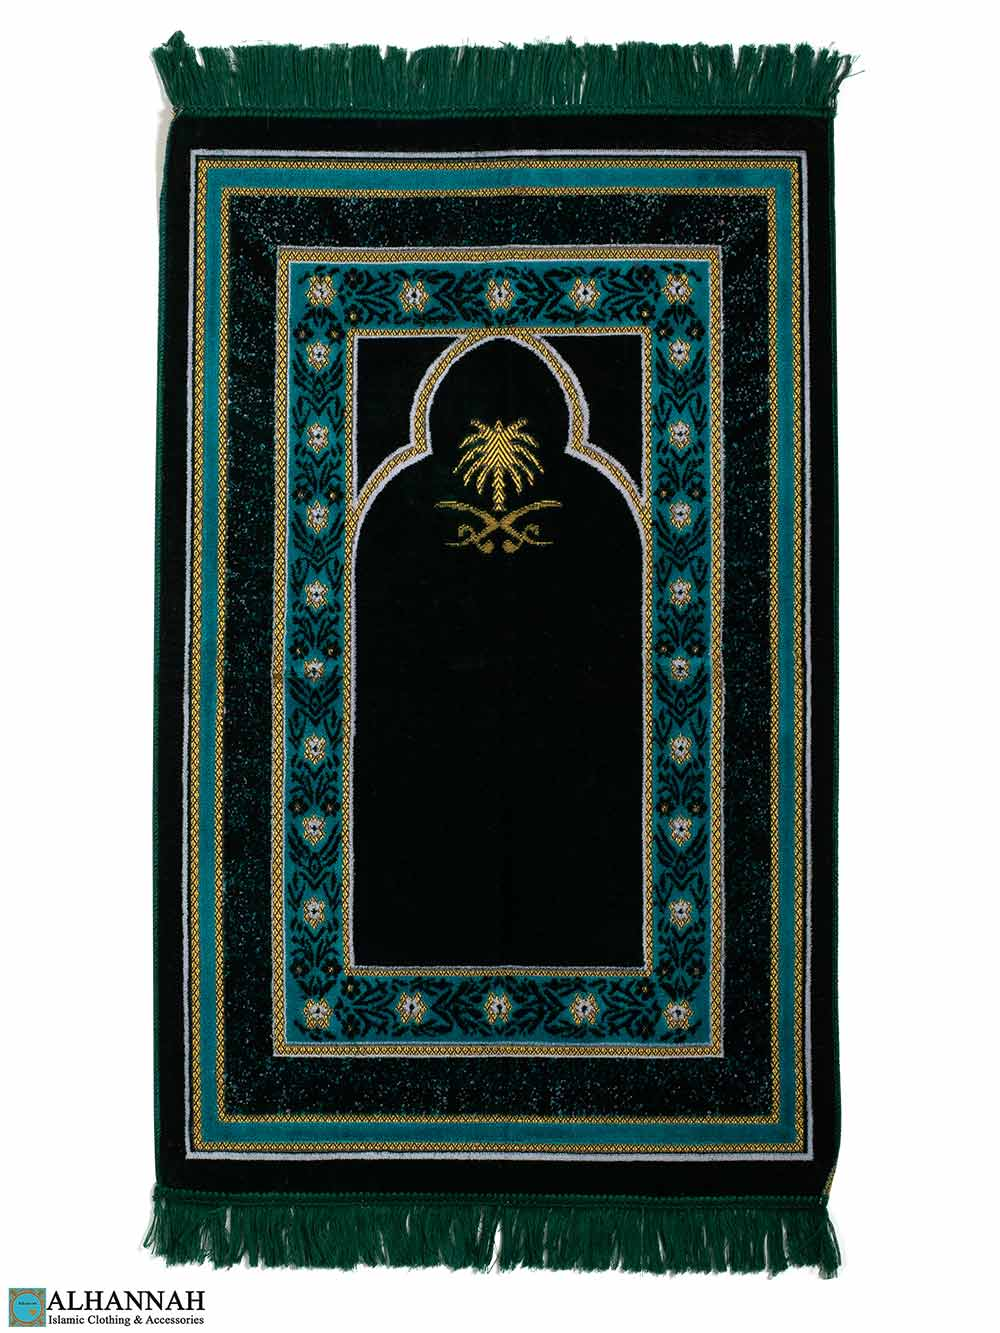 Turkish Prayer Rug with Hijaz Sword Motif - Green